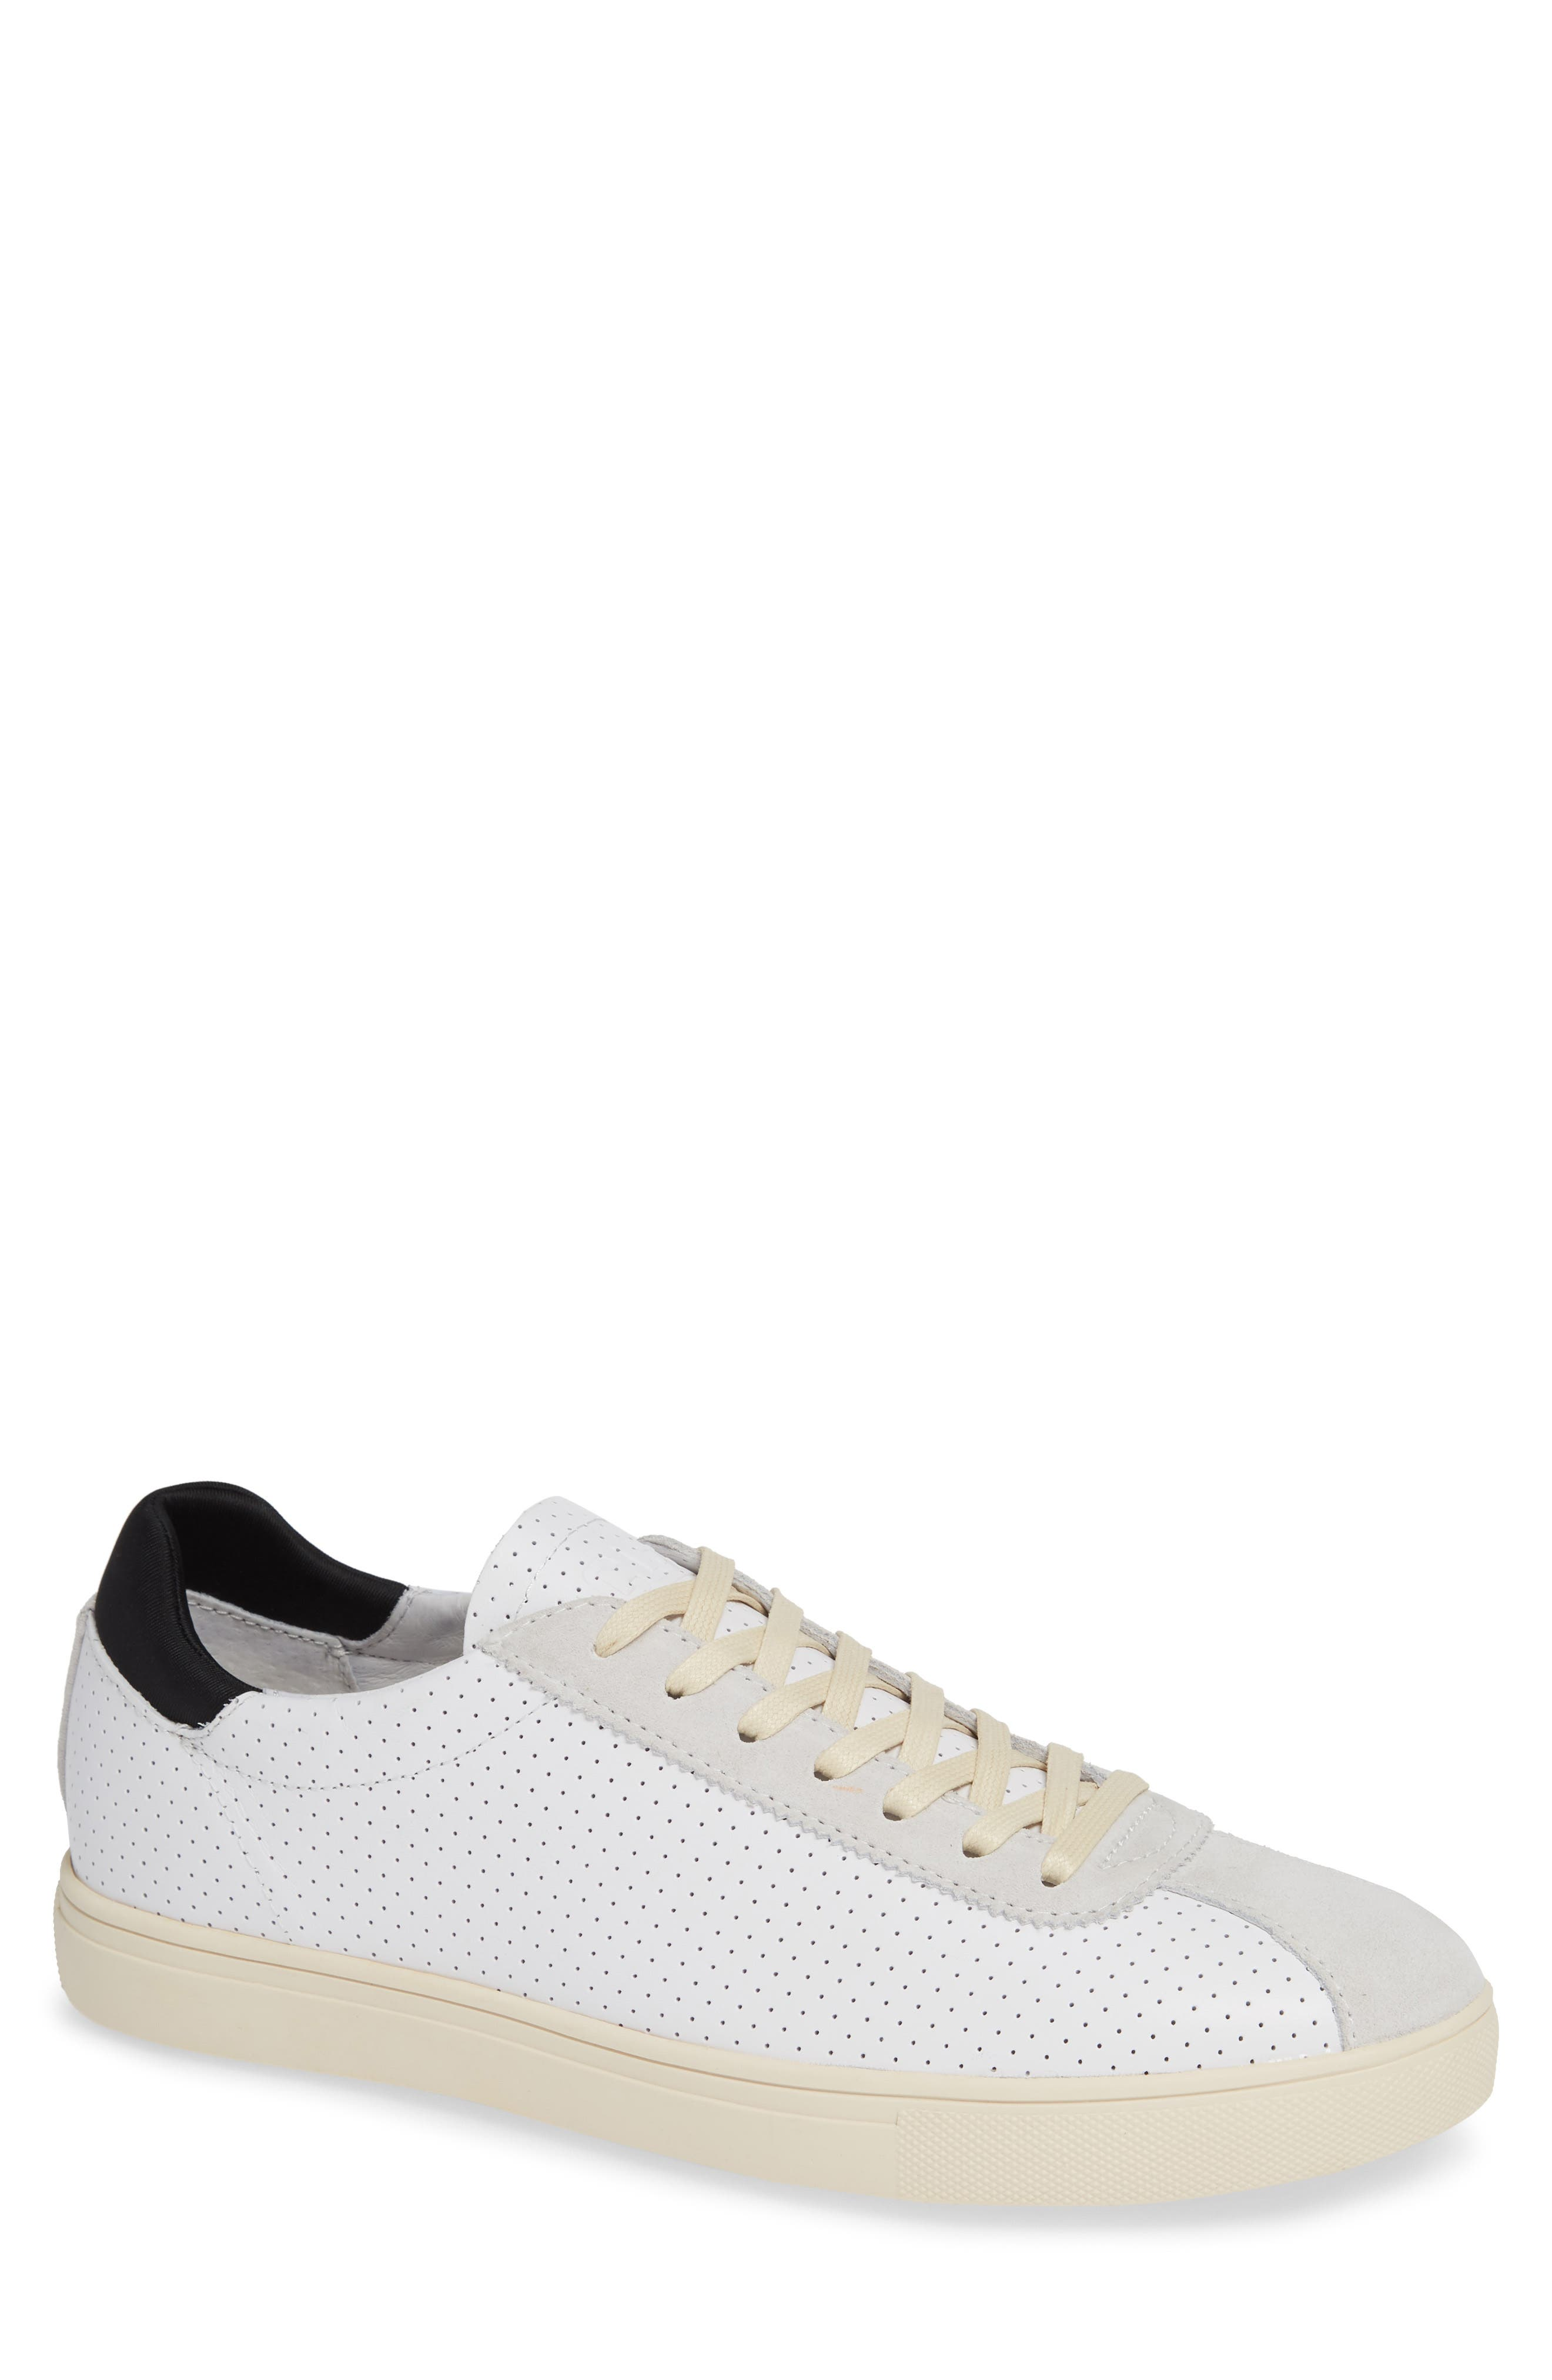 Men's CLAE Shoes   Nordstrom